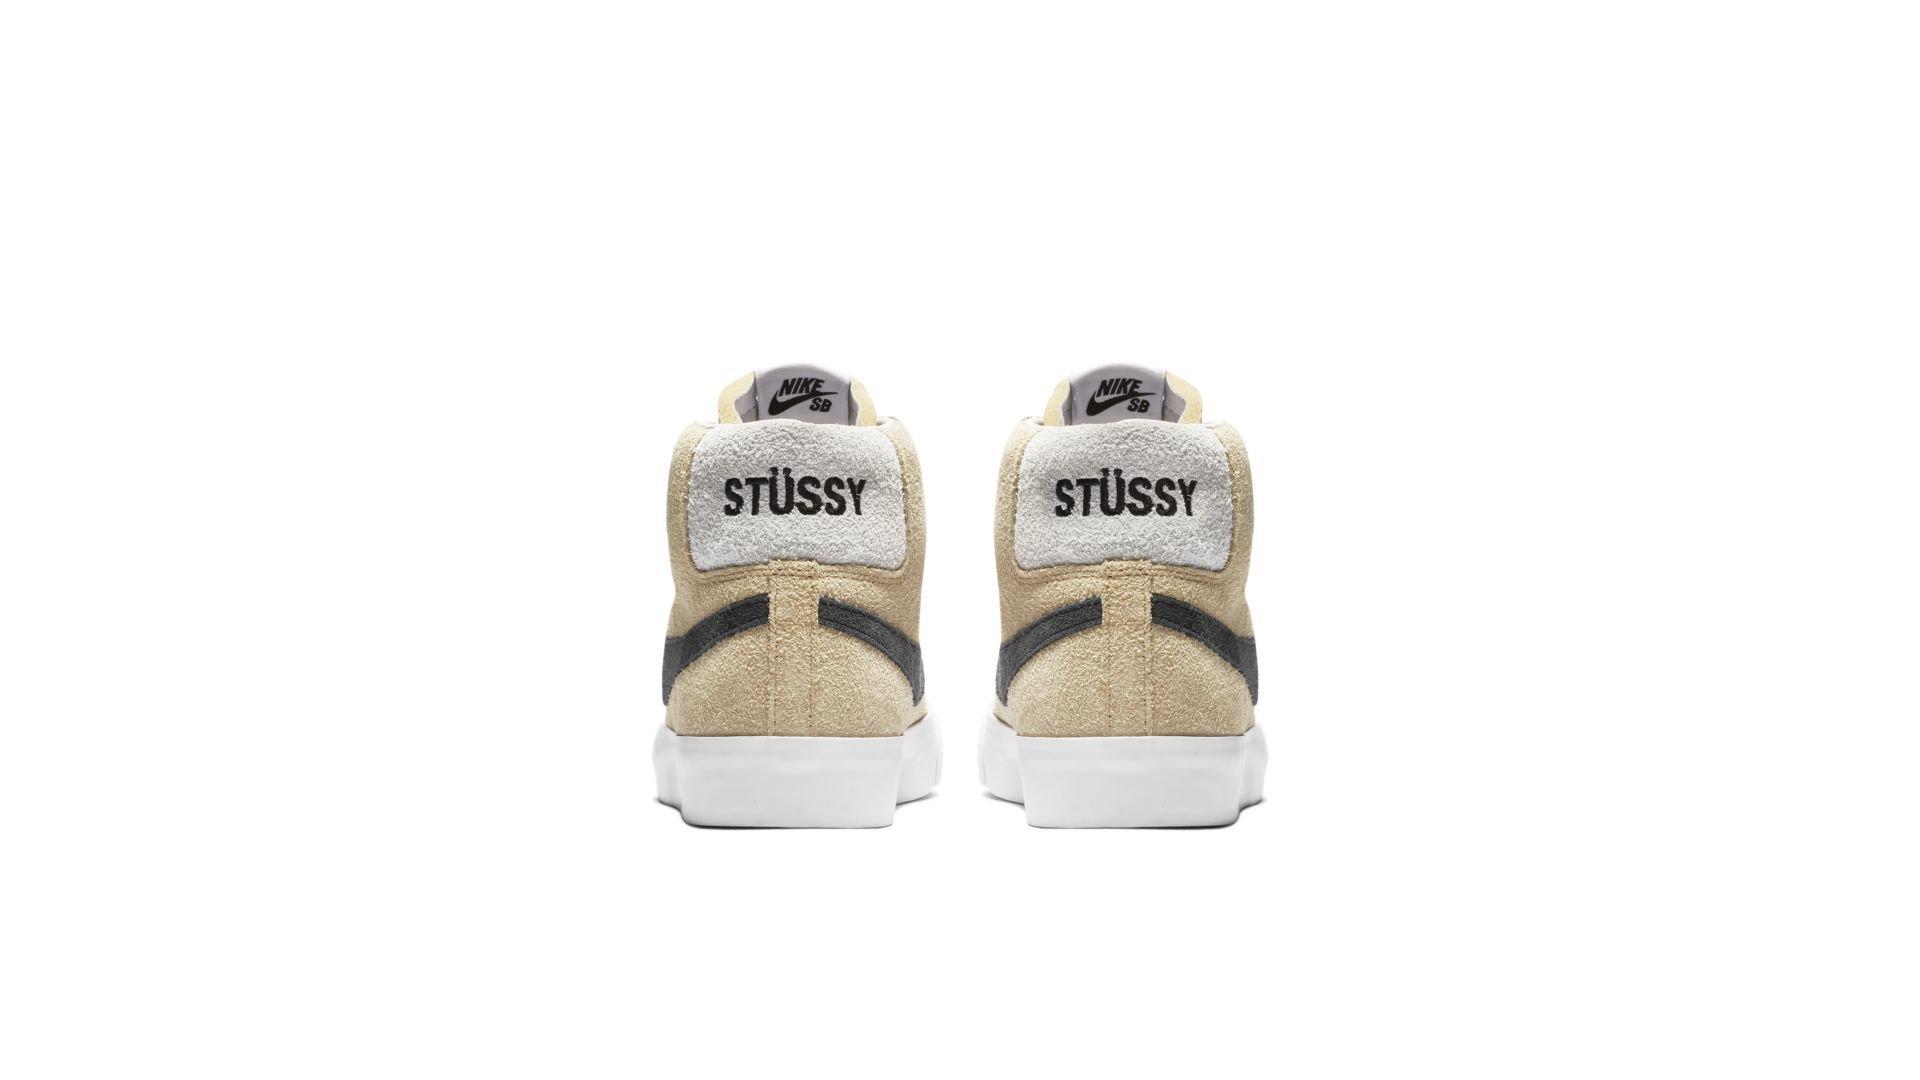 Stüssy X Lance Mountain X Nike SB Blazer Mid QS (AH6158-700)